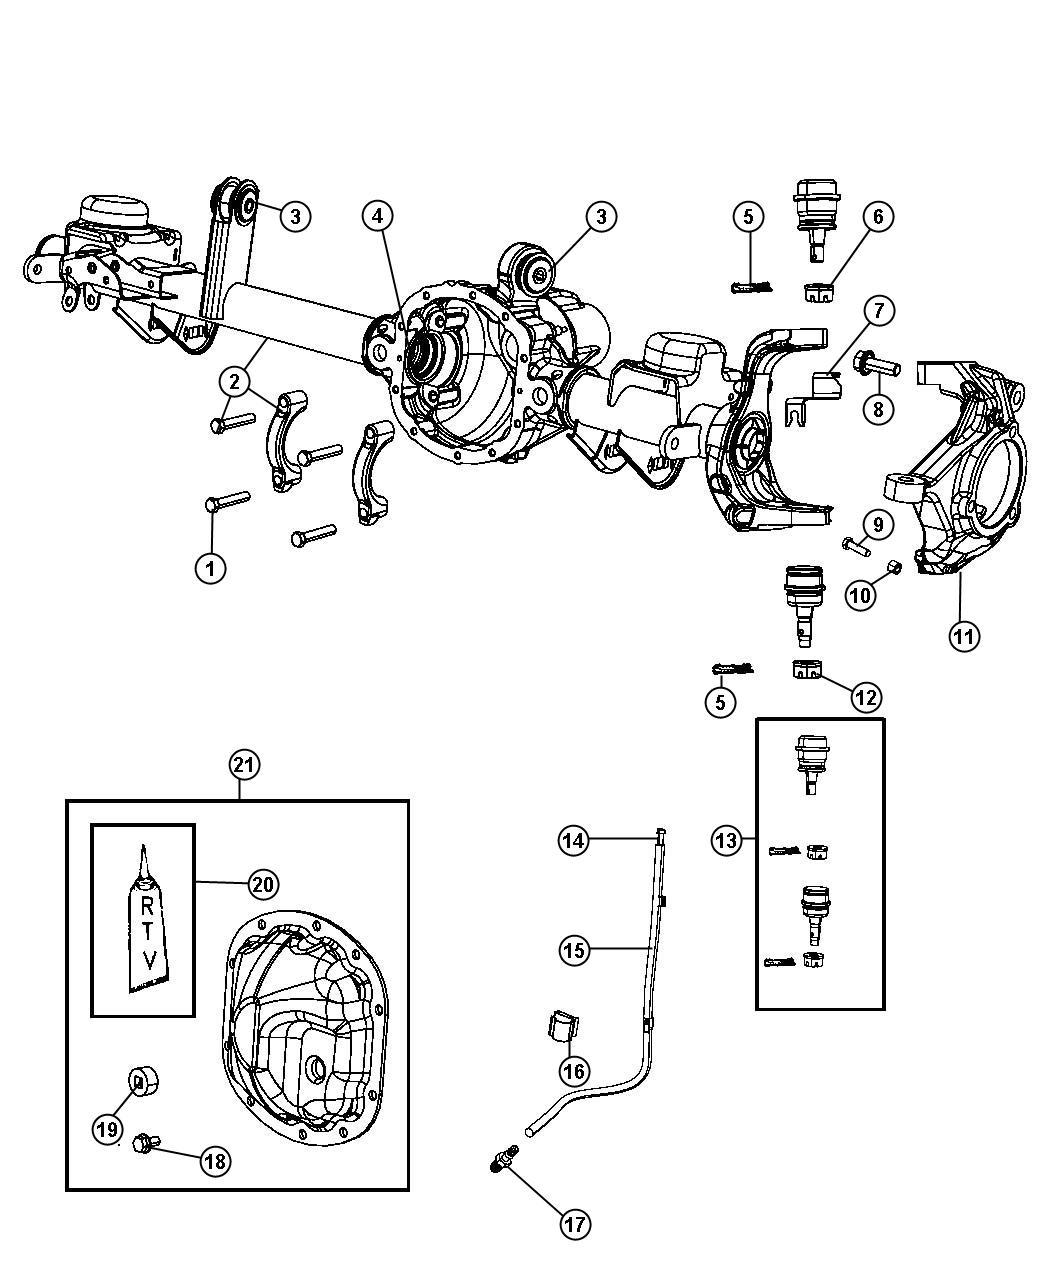 Jeep Wrangler Unlimited X 3 8l V6 A T 4x4 Bushing